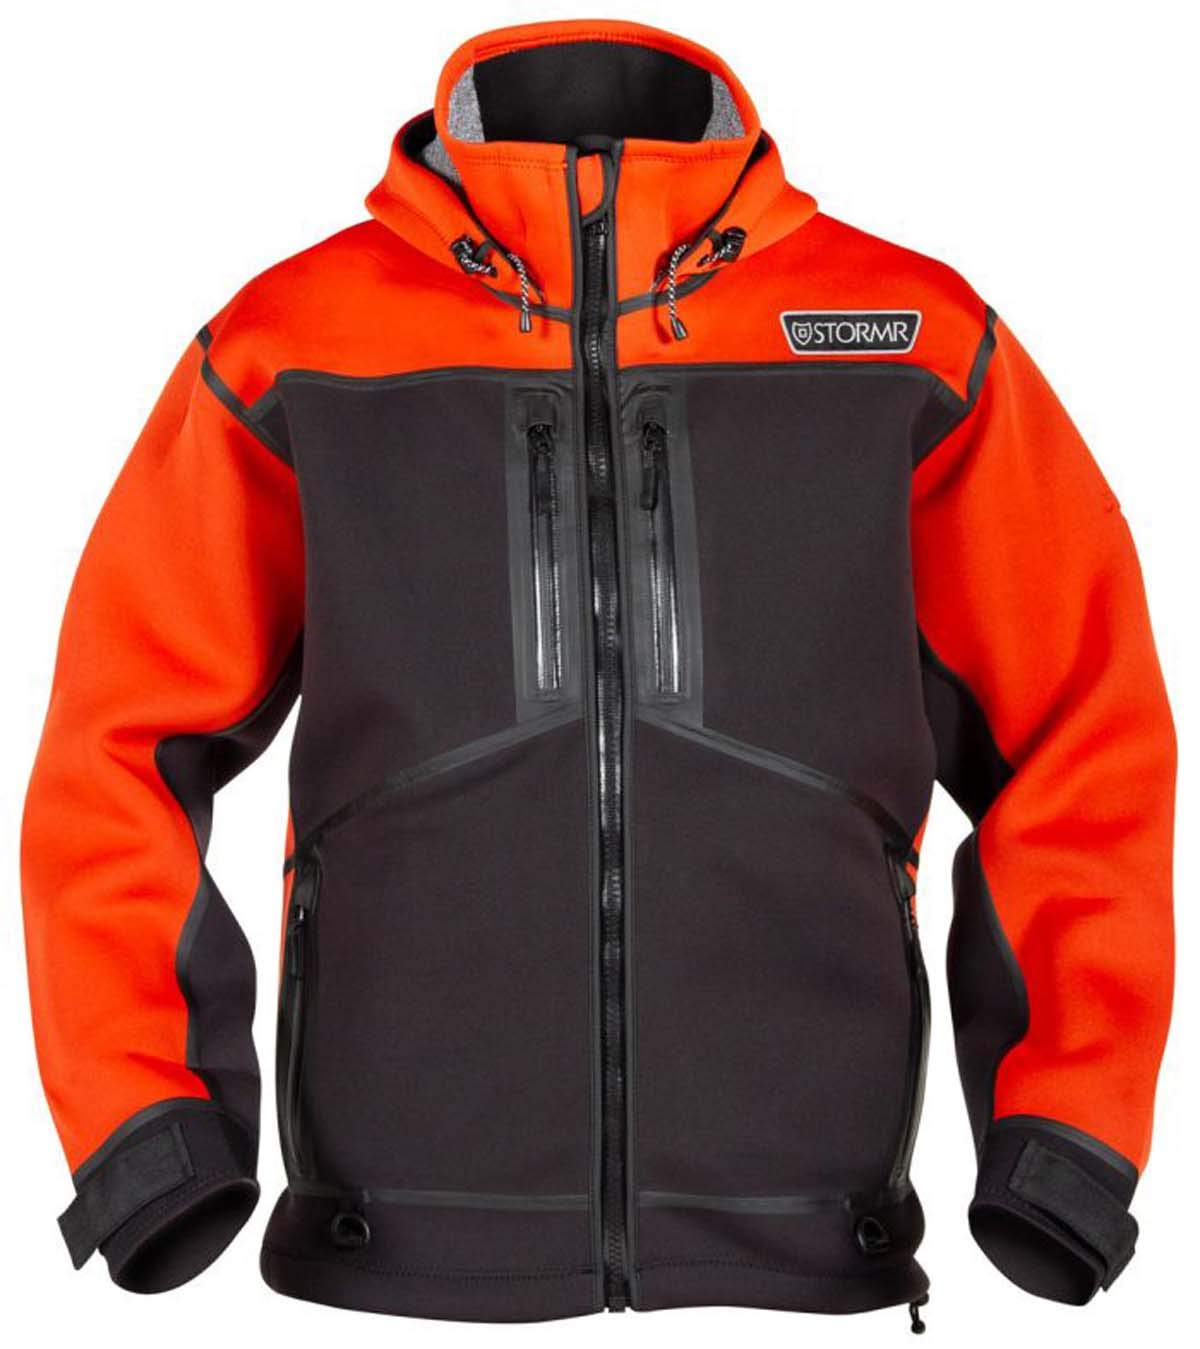 STORMR Strykr Neoprene Jacket, Safety Orange, Medium